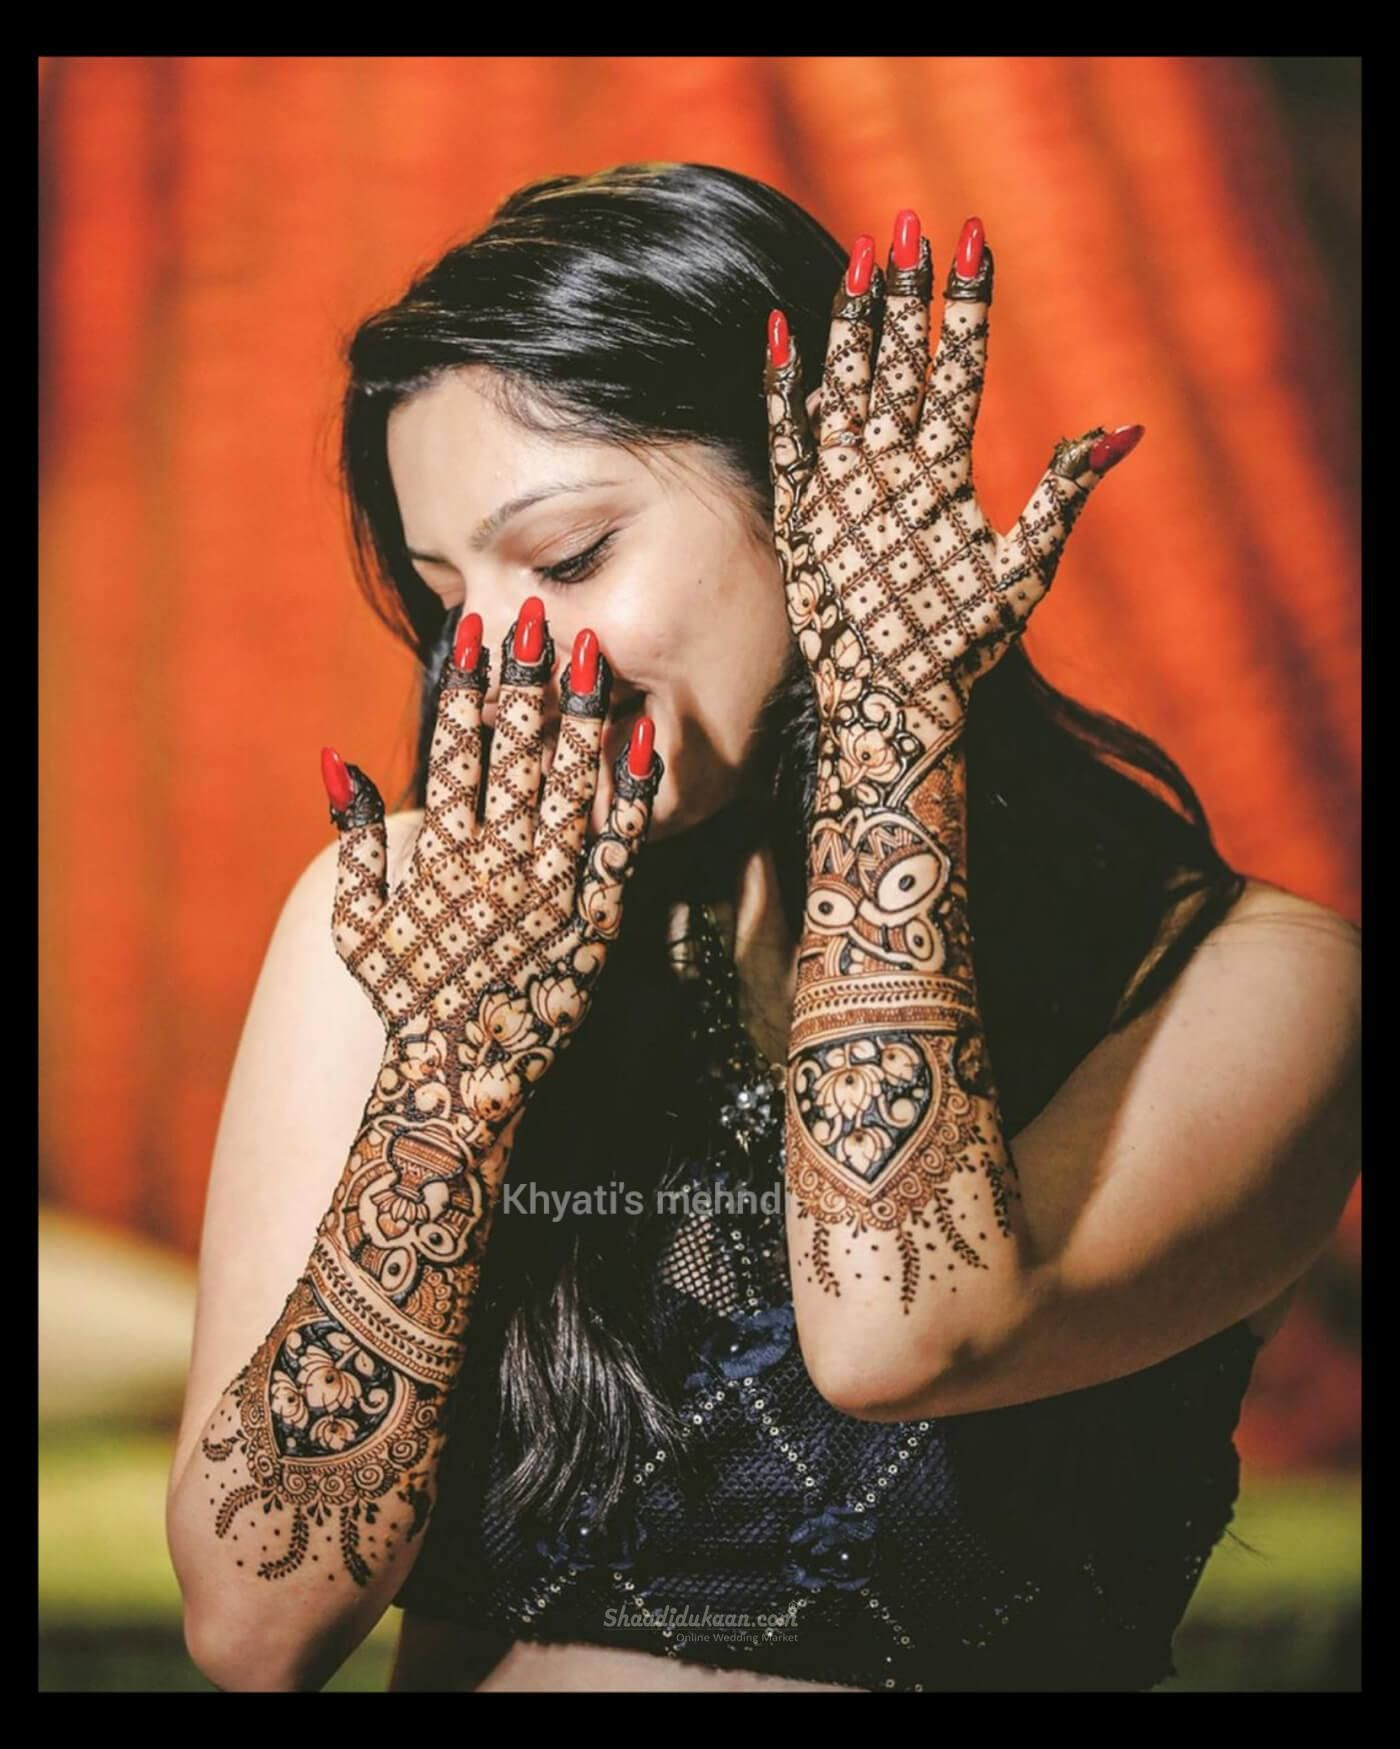 Khyati's Bridal Mehandi  | Mehndi Artist in Rajkot#henna #mehndi #wedding #hennaart #hennaartist #mehendidesign #hennatattoo #hennadesigns #mehendiart #hennadesign #mehendiartist #bridalhenna #indianwedding #mehendioutfit #hennainspire #mehandi #hennawedding  #hennalove #bridalmehendi #mehendidesigns #mehendilove #indianbride #shaadidukaan